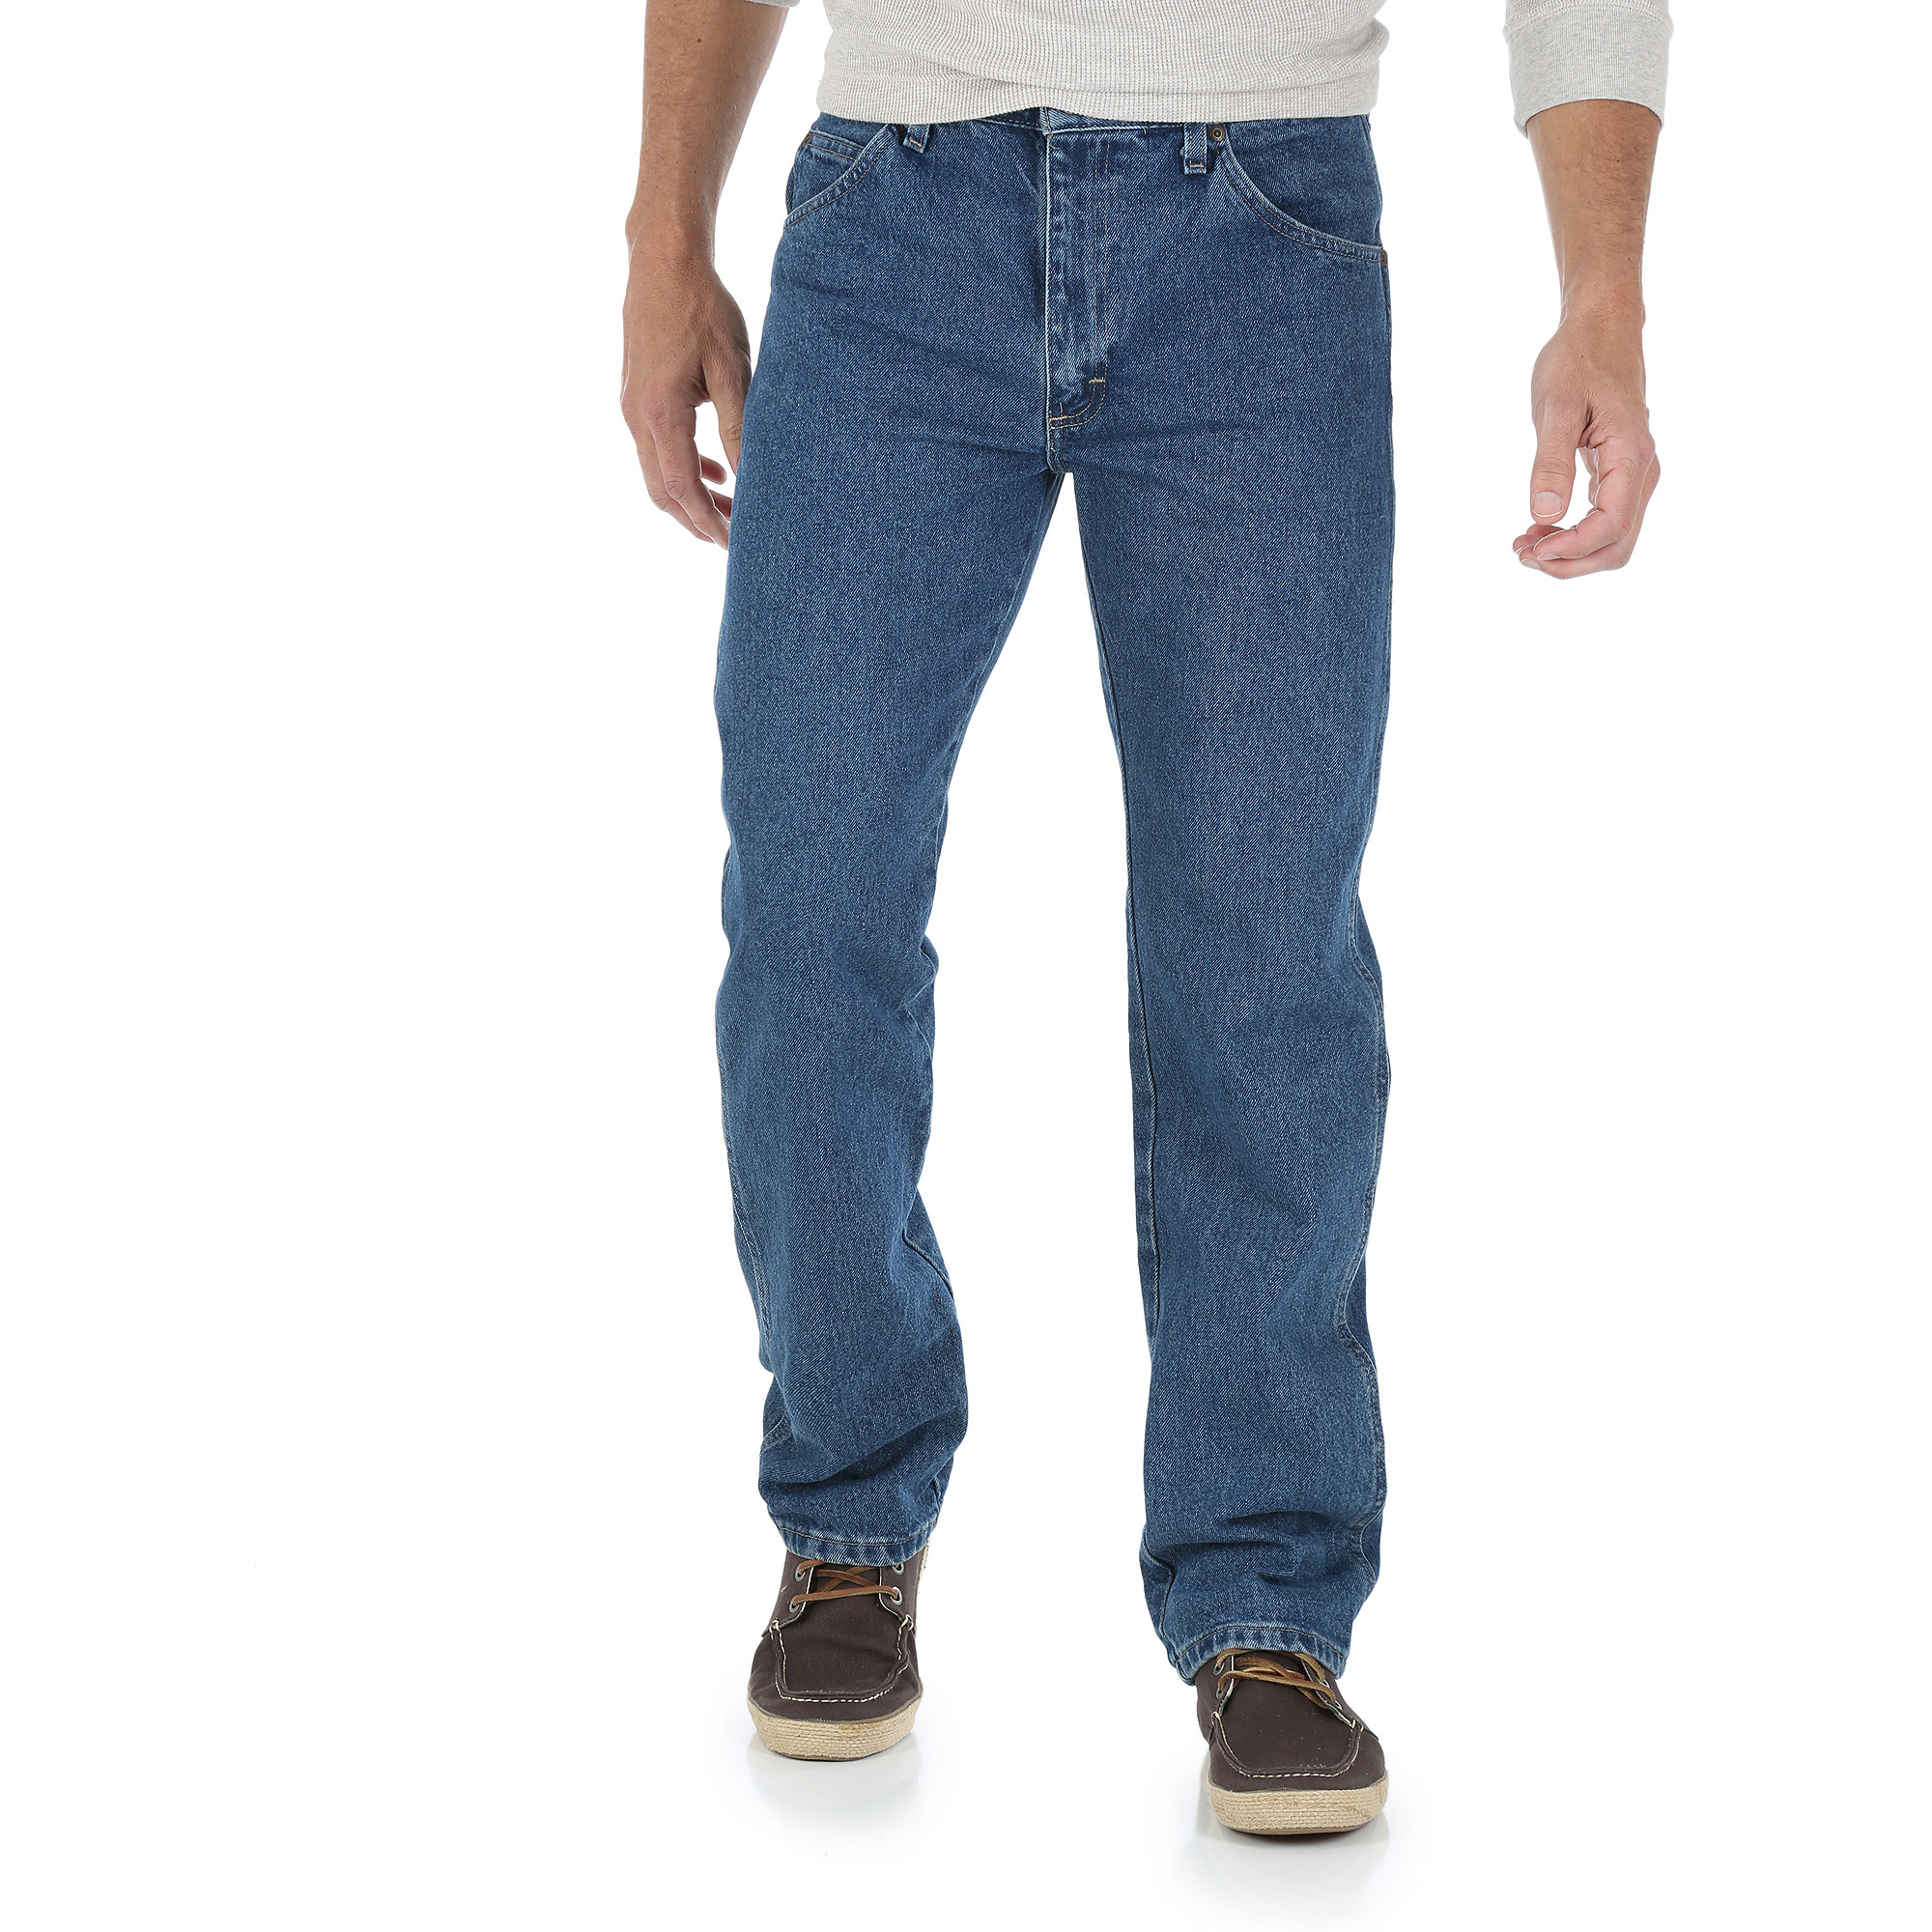 Wrangler Five Star - Big Men's Regular Fit Jeans